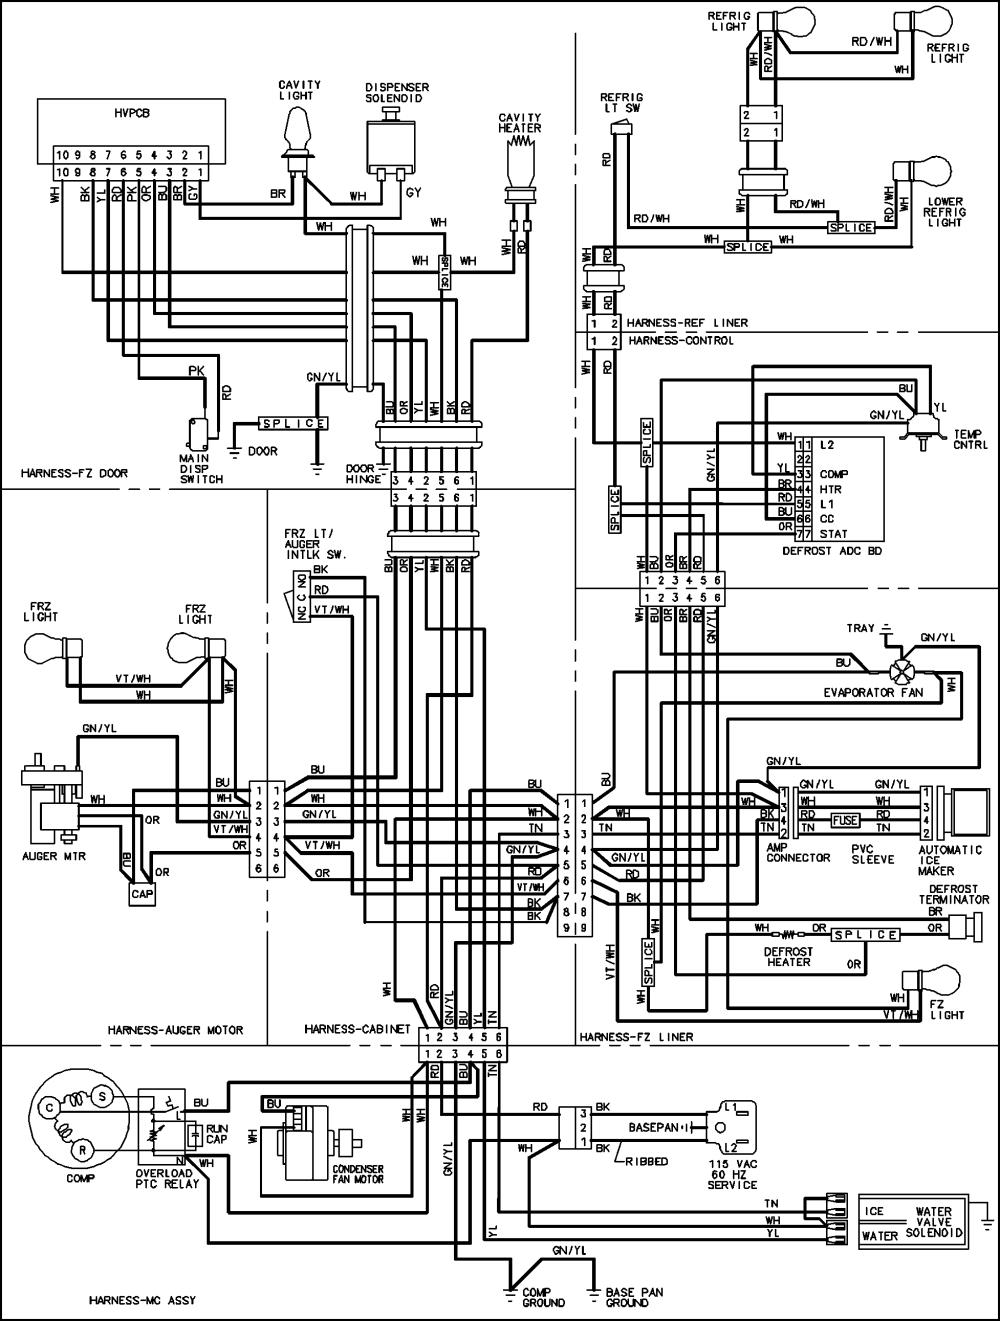 medium resolution of amana ice maker wiring diagram wiring library diagram z2wiring diagram for maytag refrigerator library wiring diagram